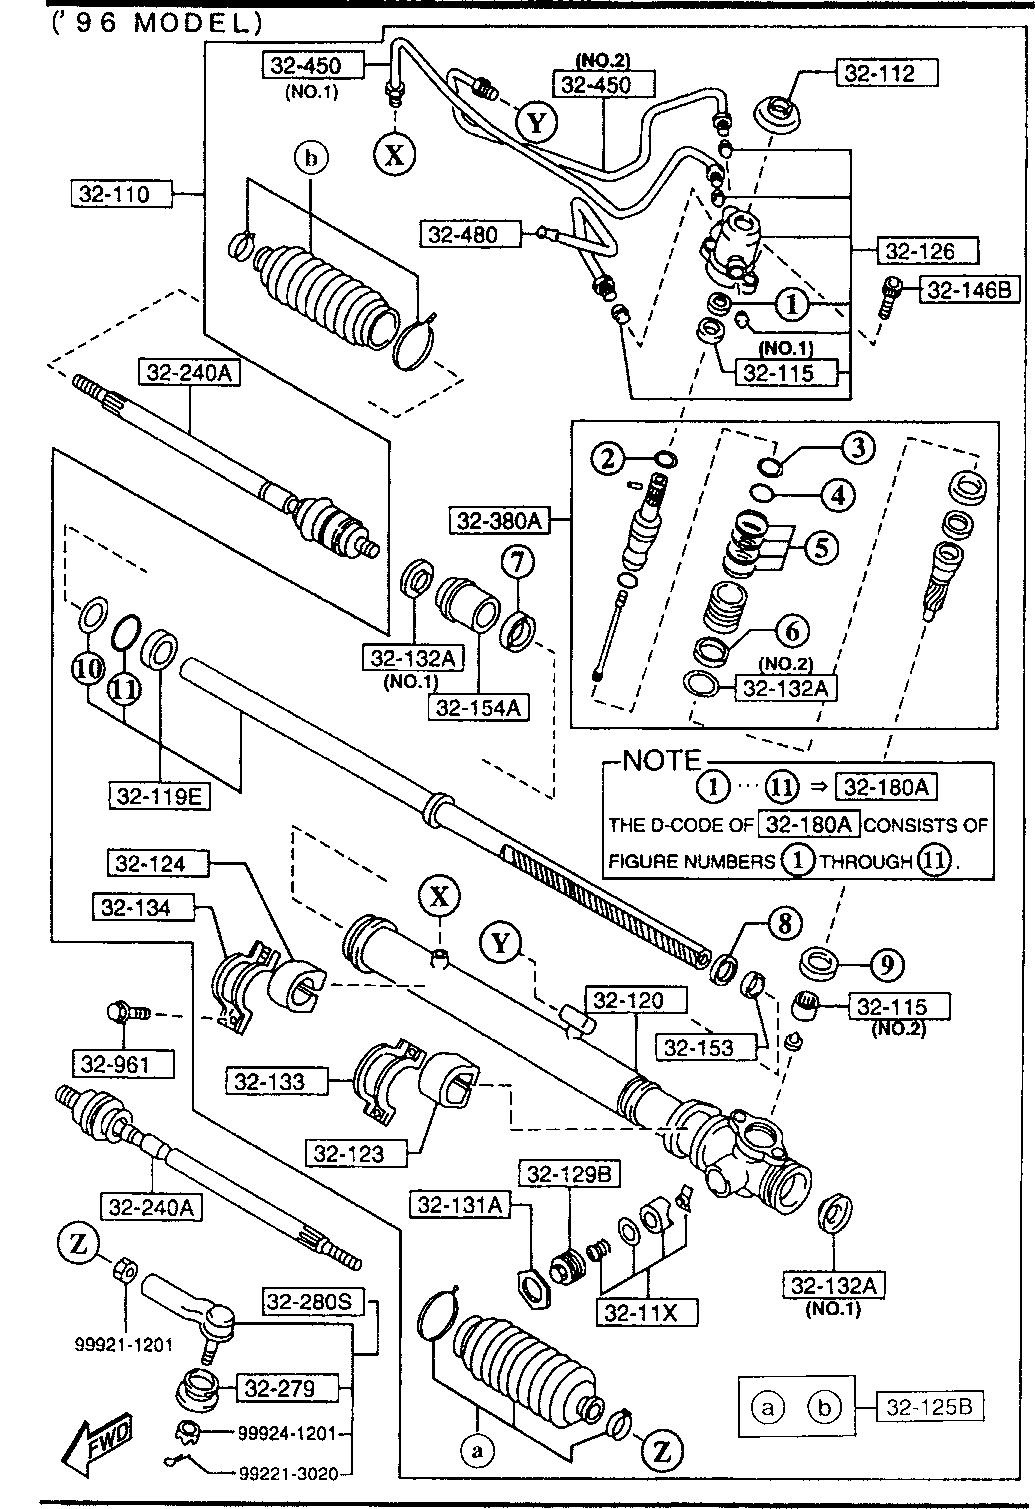 31 Mazda Miata Parts Diagram